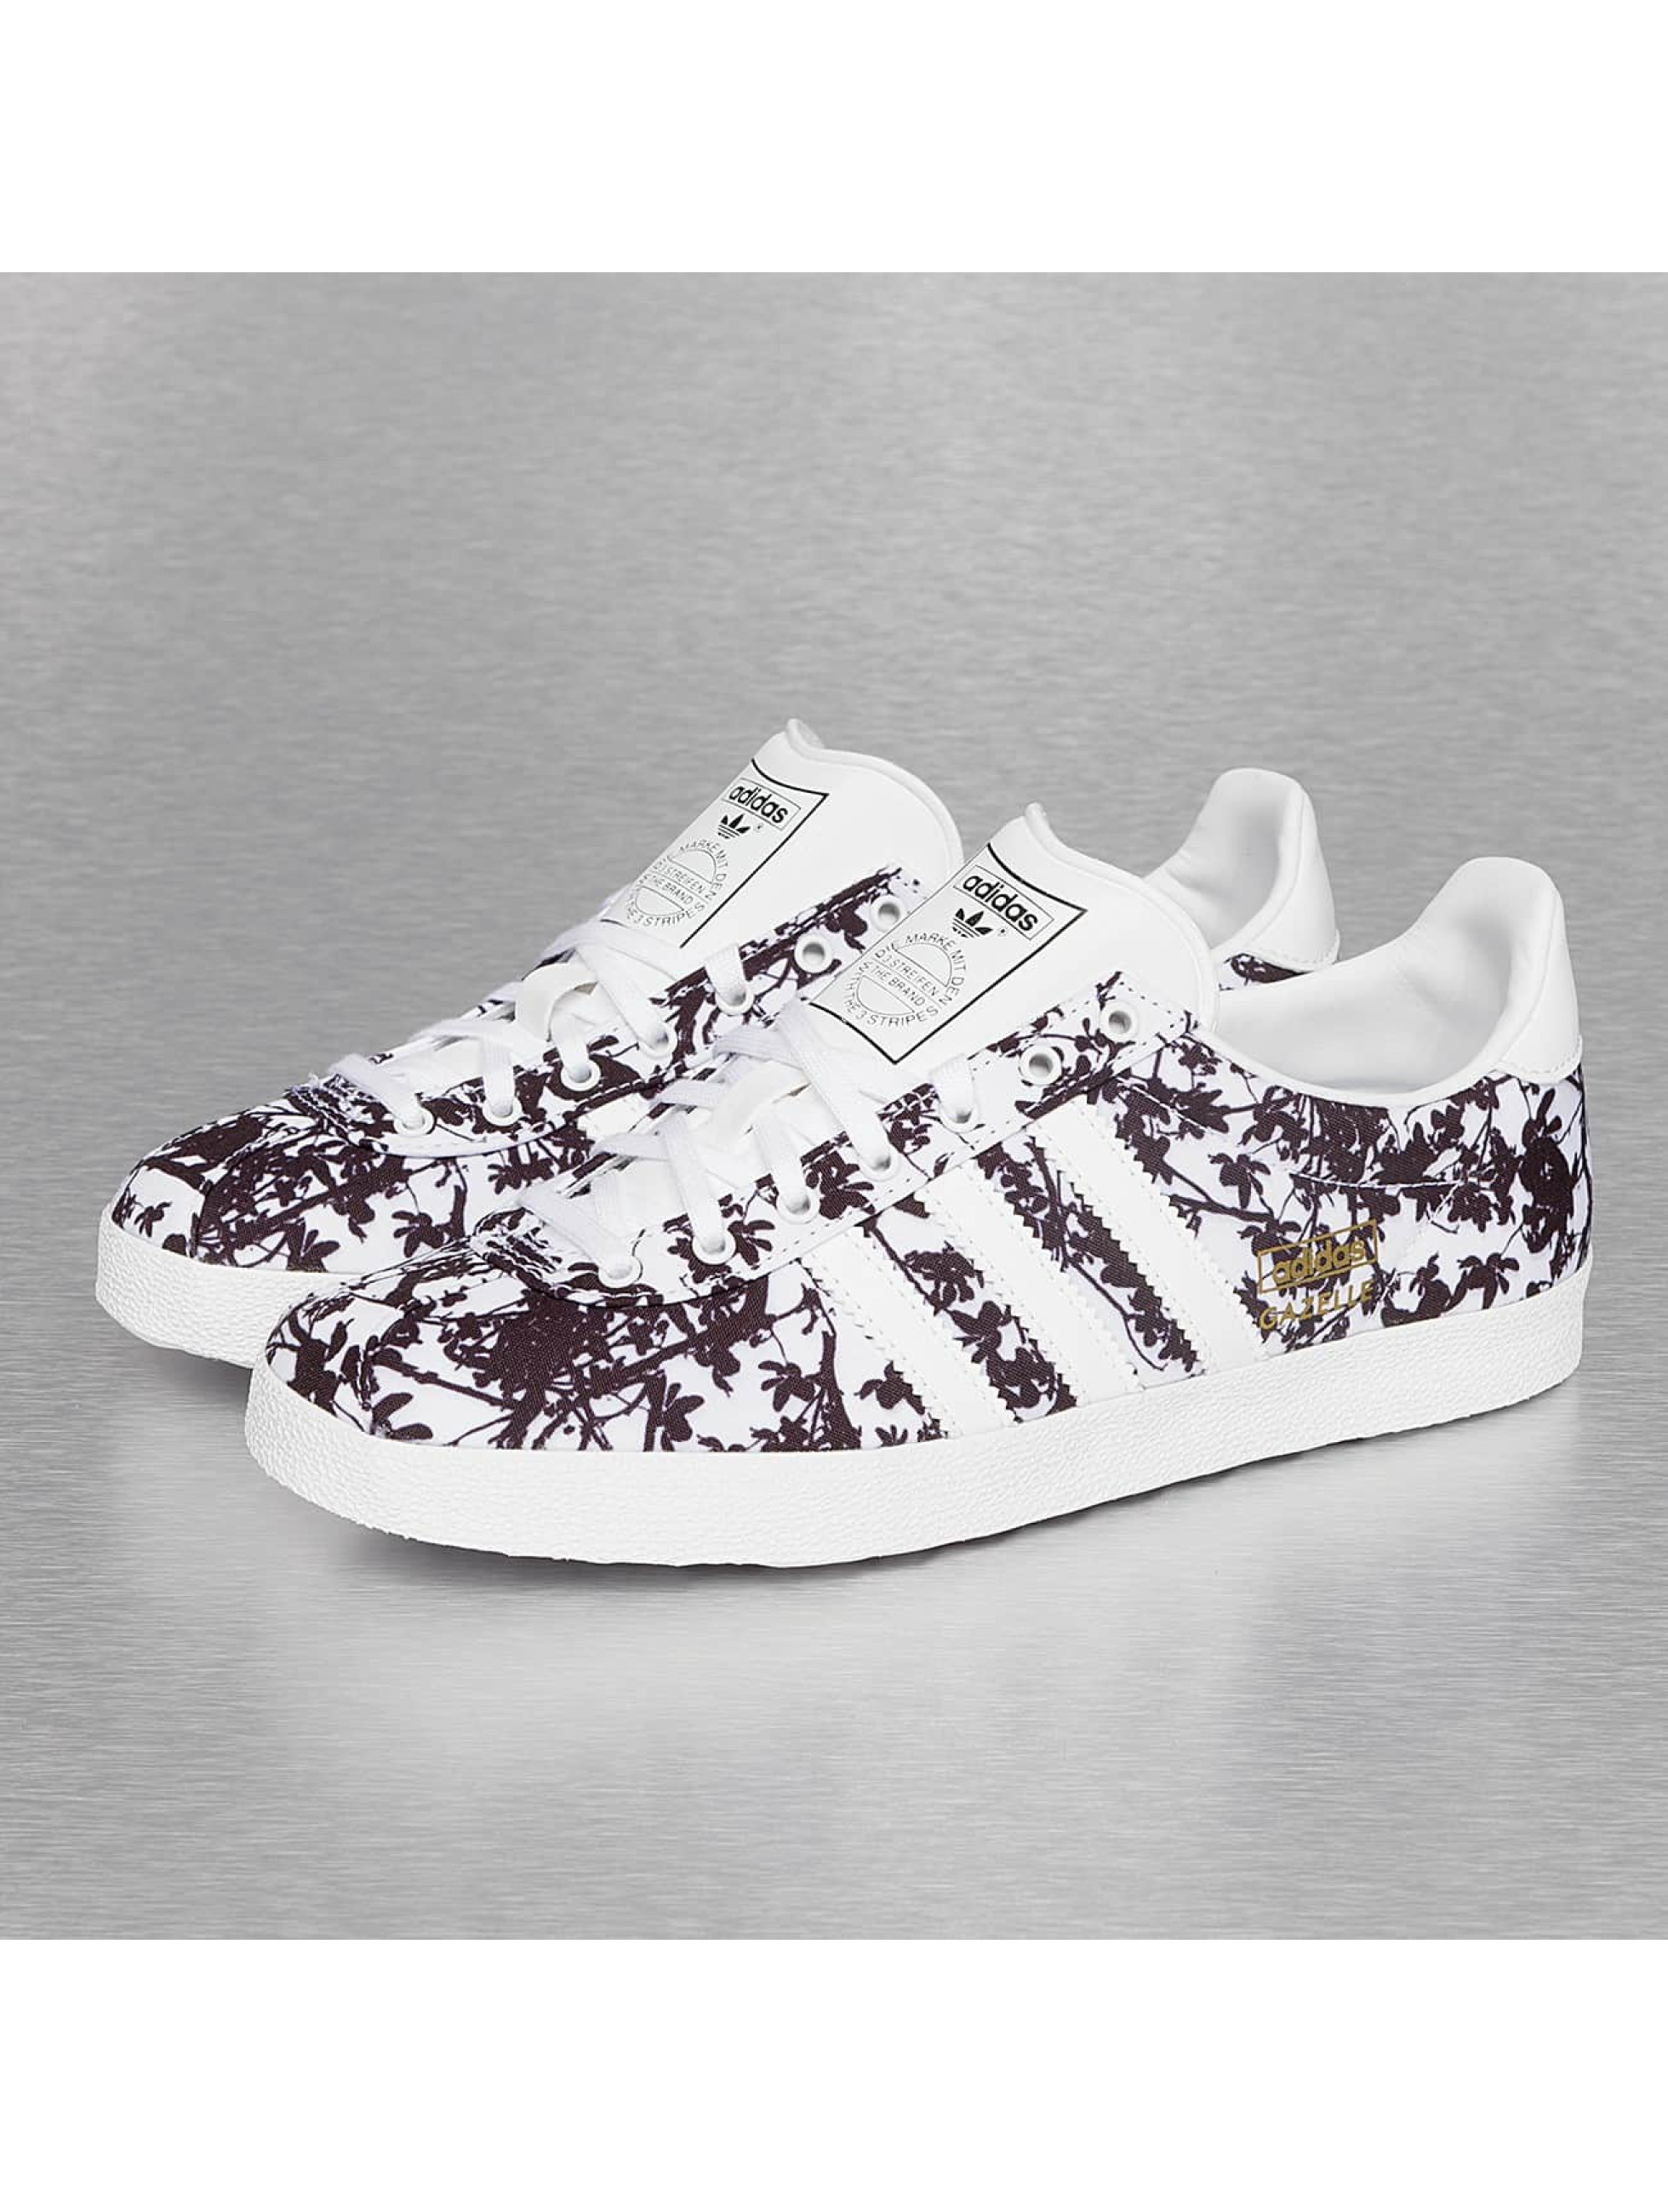 adidas gazelle femme a fleurs